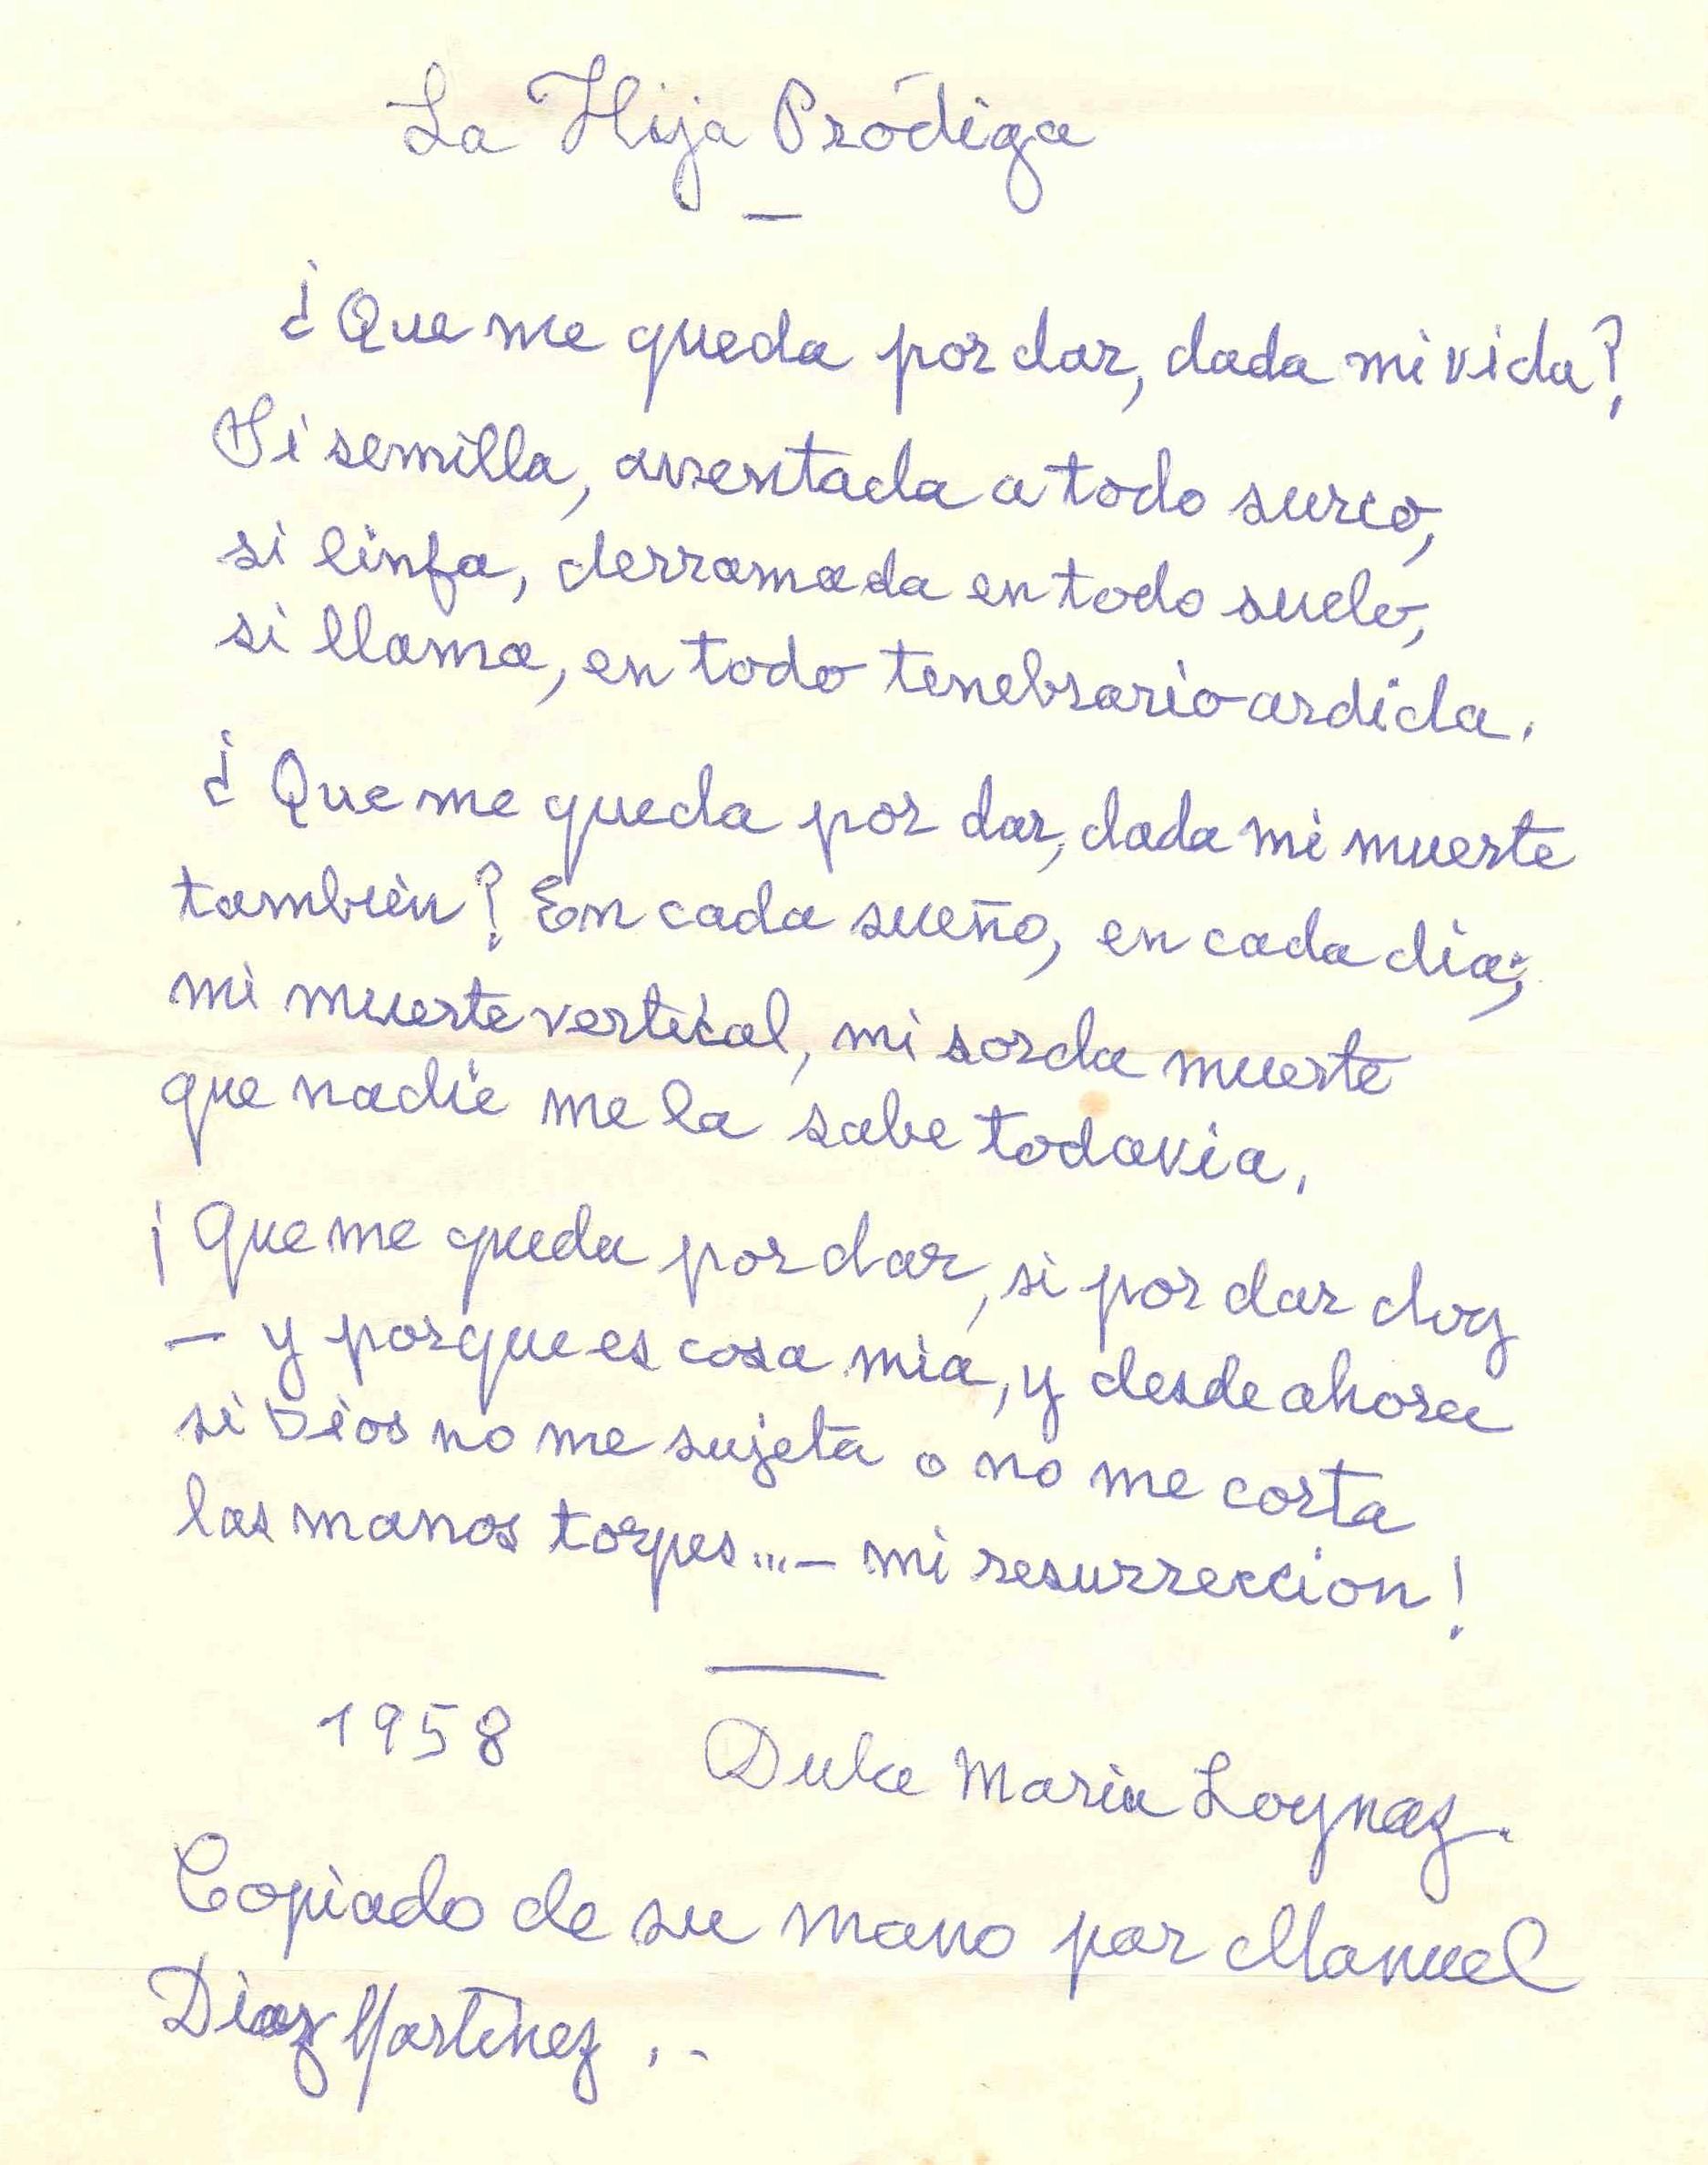 Poema al denudo - 1 4